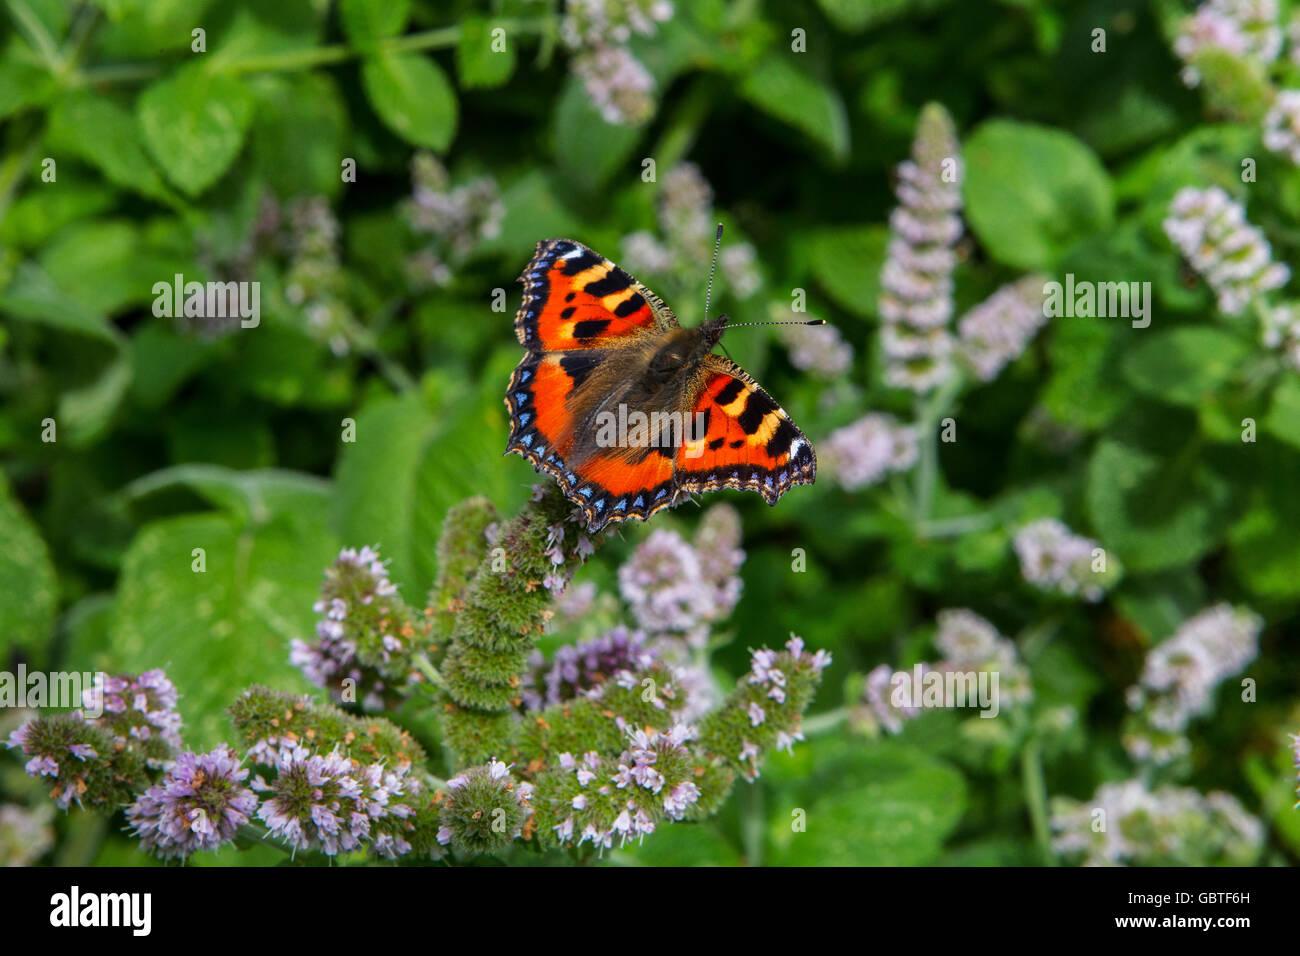 Nymphalidae    Small Tortoiseshell         Aglais urticae - Stock Image